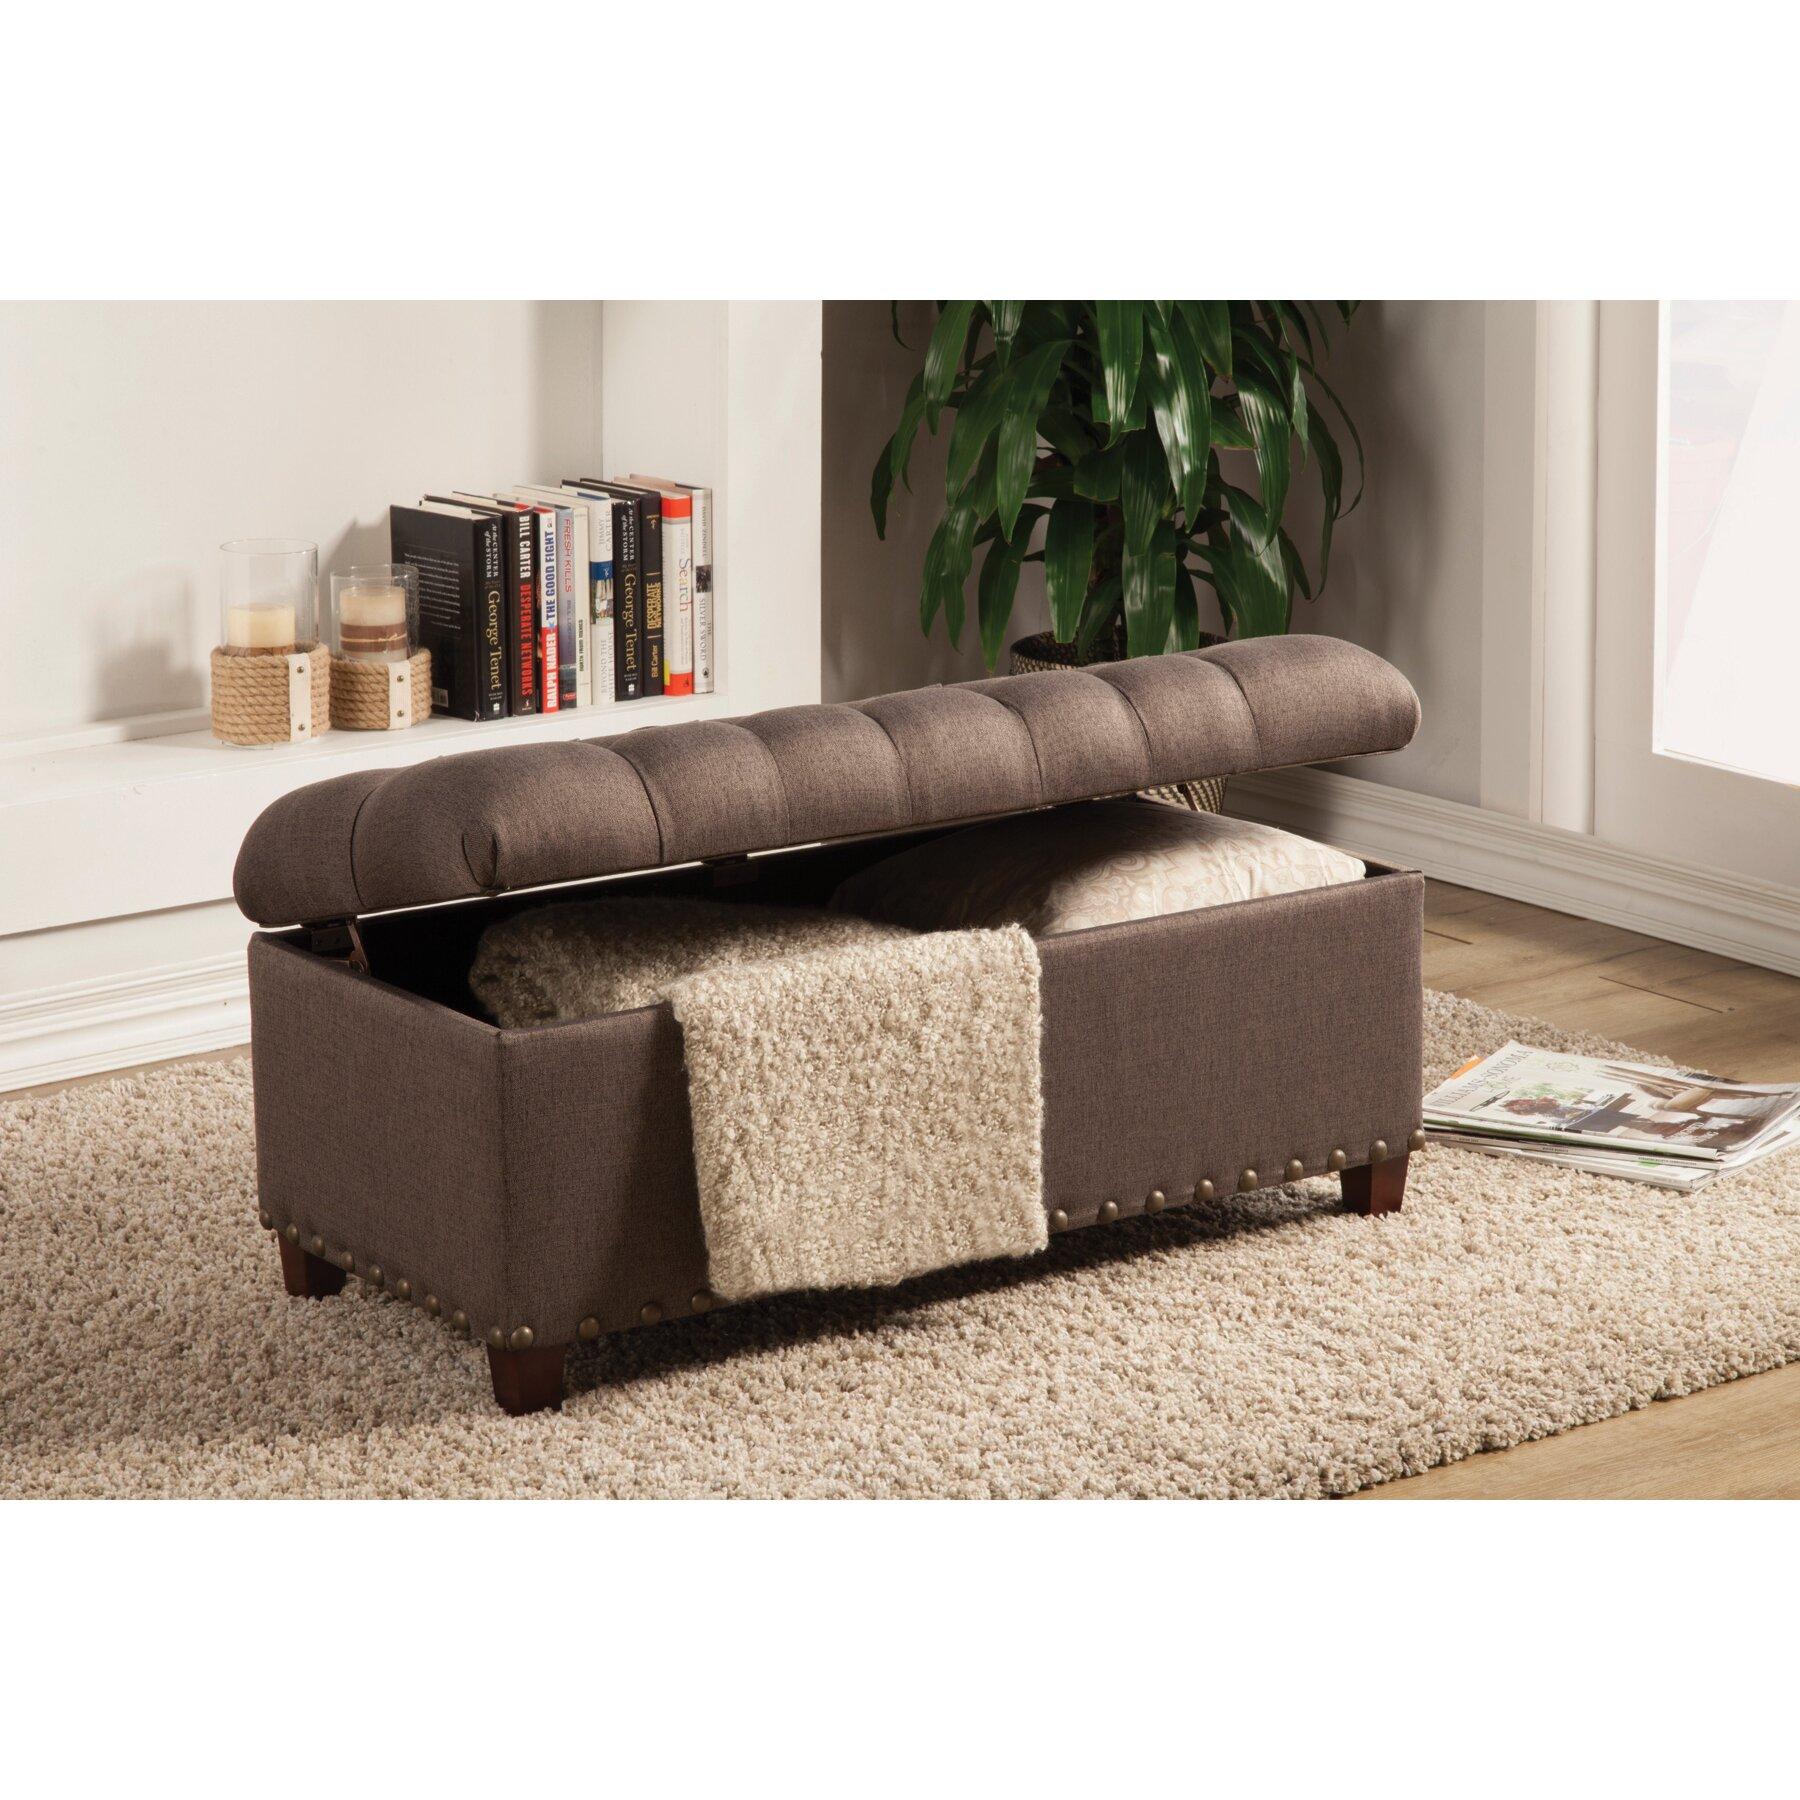 Henderson Upholstered Storage Bedroom Bench | Wayfair